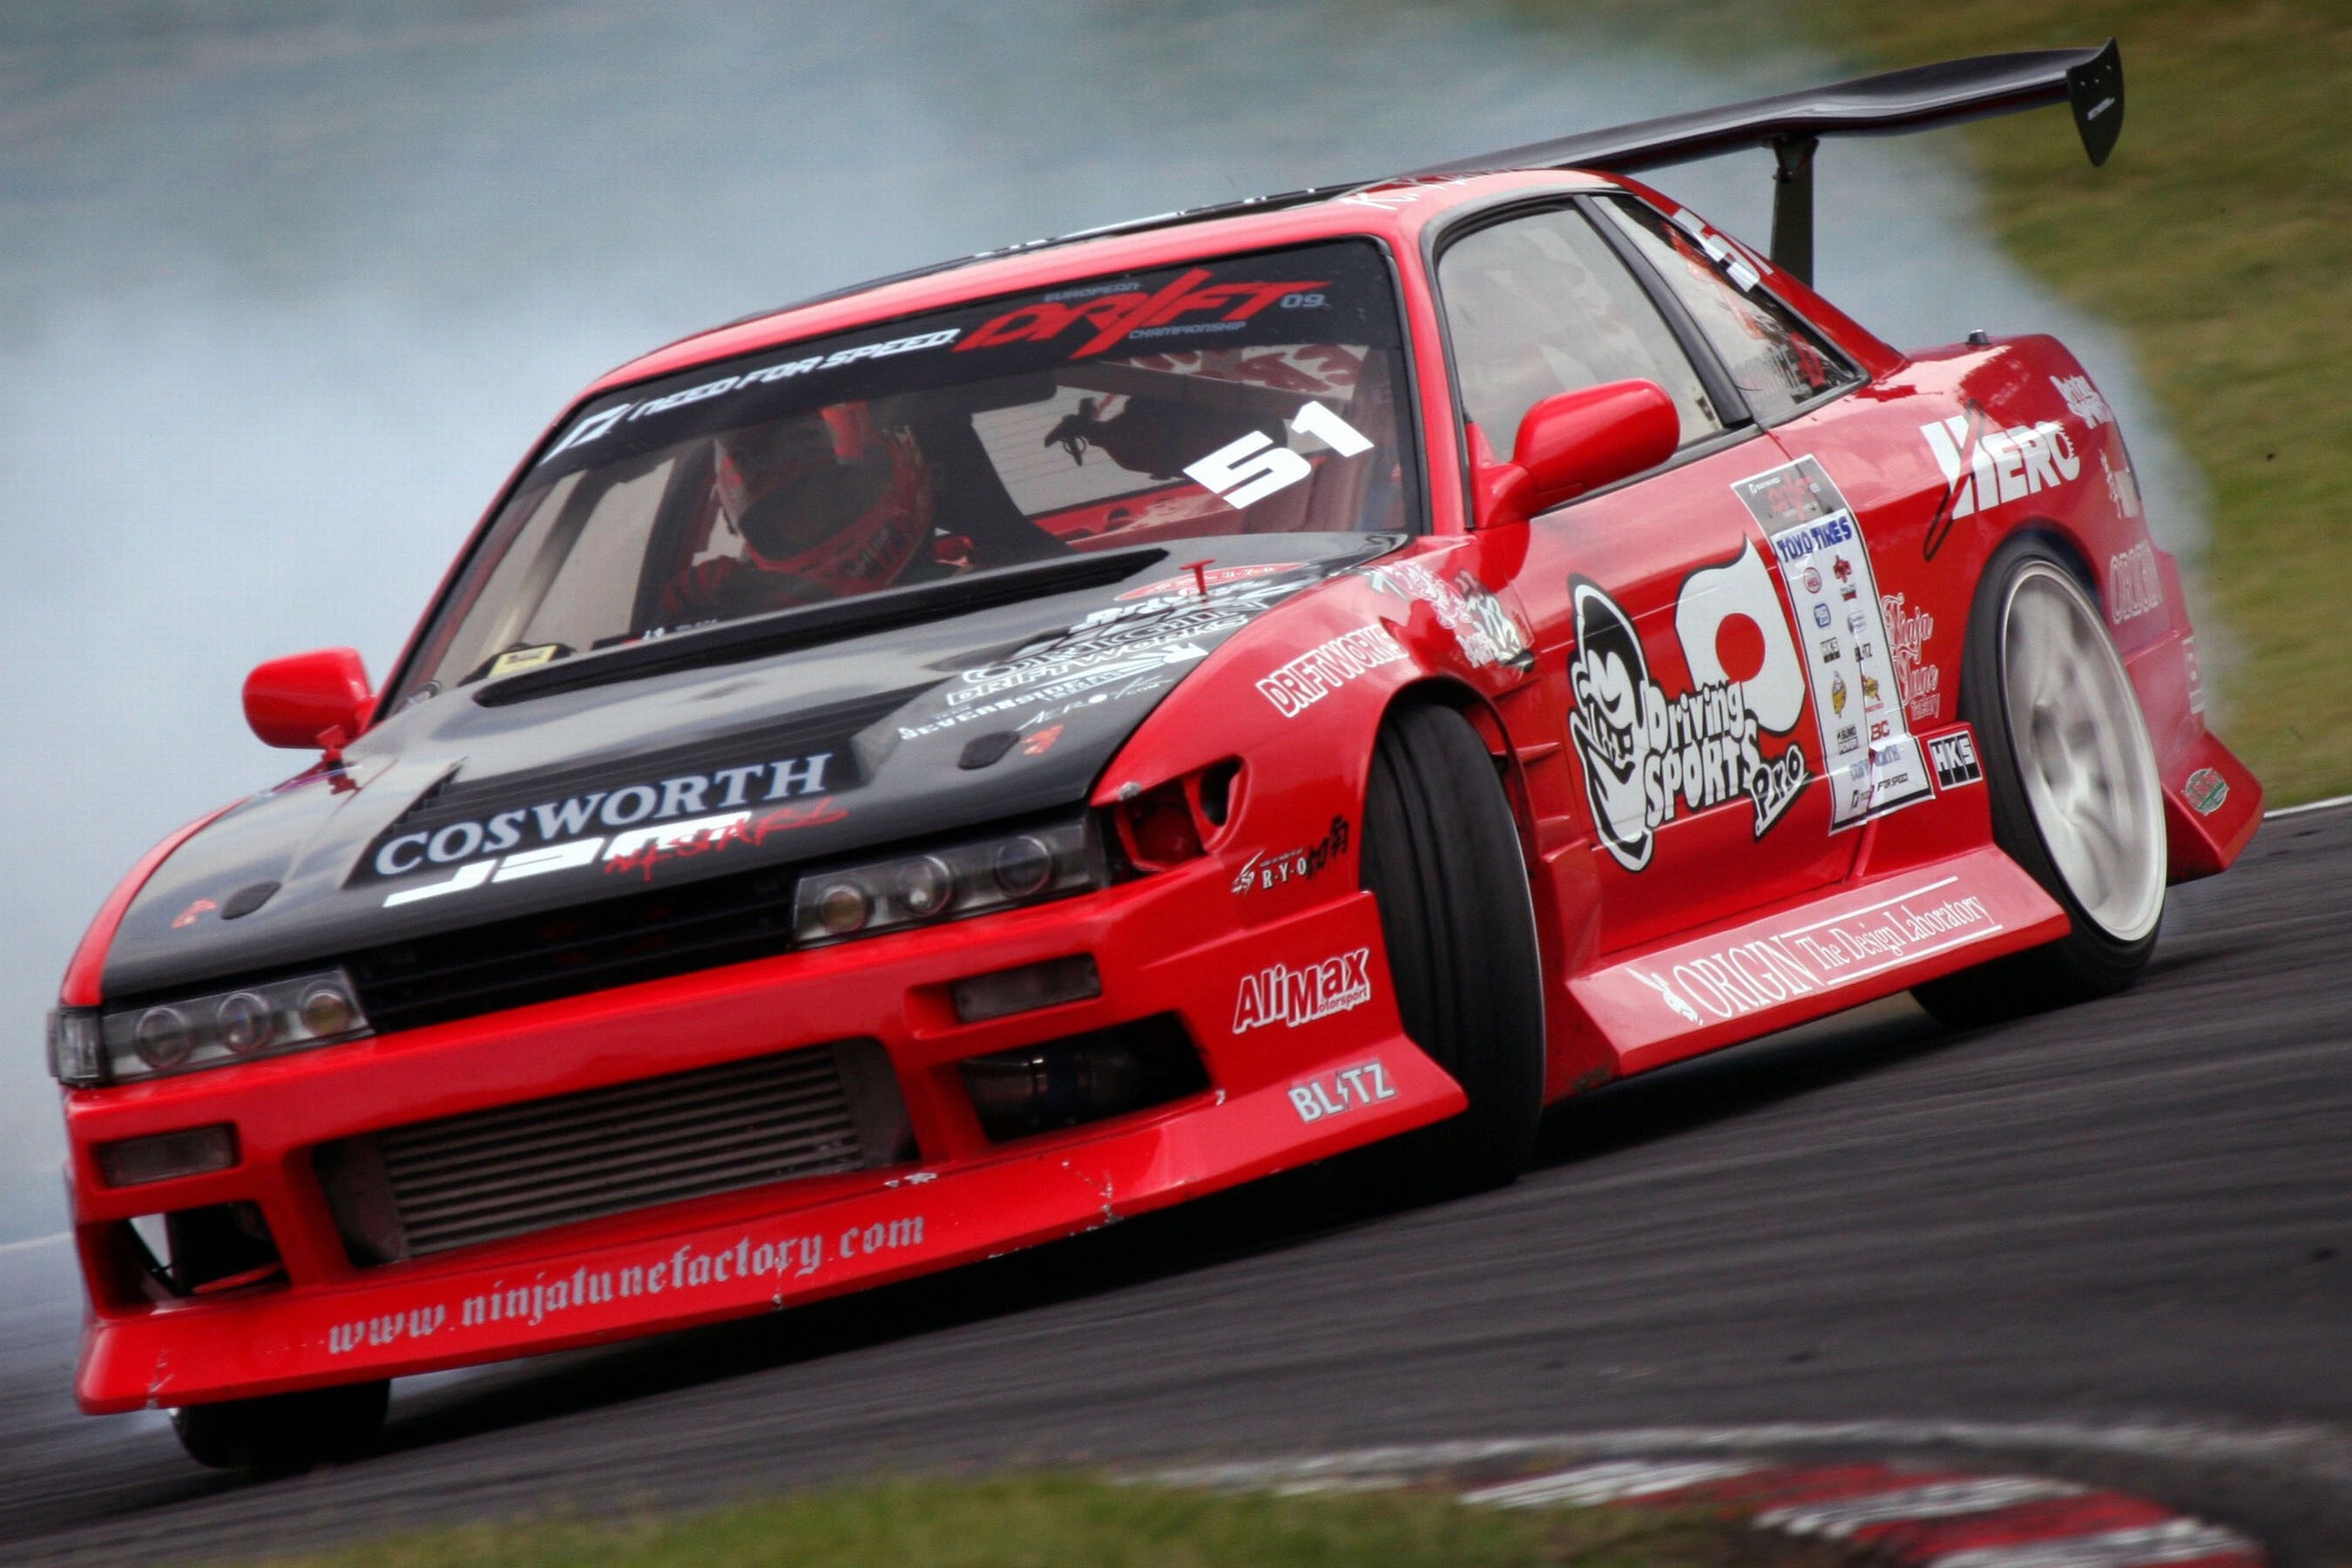 Nissan Silvia S13 Drift Car